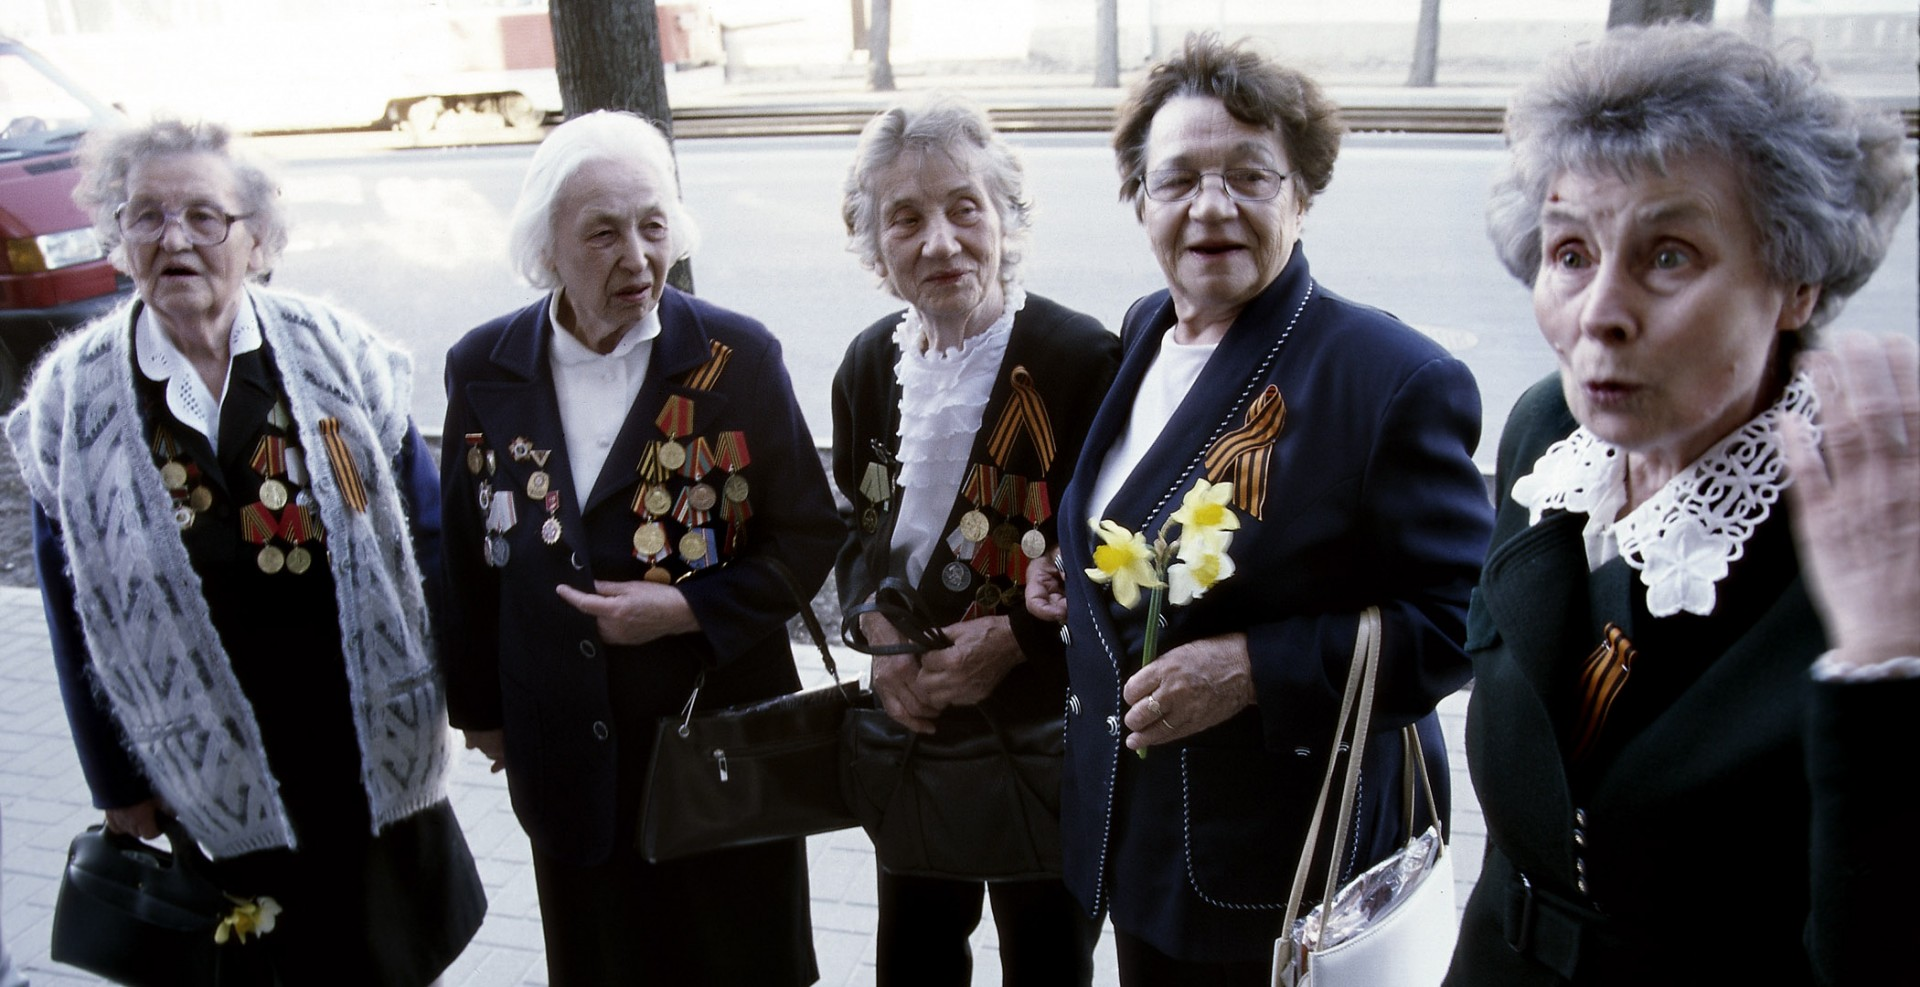 Reportage-Fotograf-in-Paris-Reportage-Fotografie-Veteraninnen-in-Riga-mit-Orden